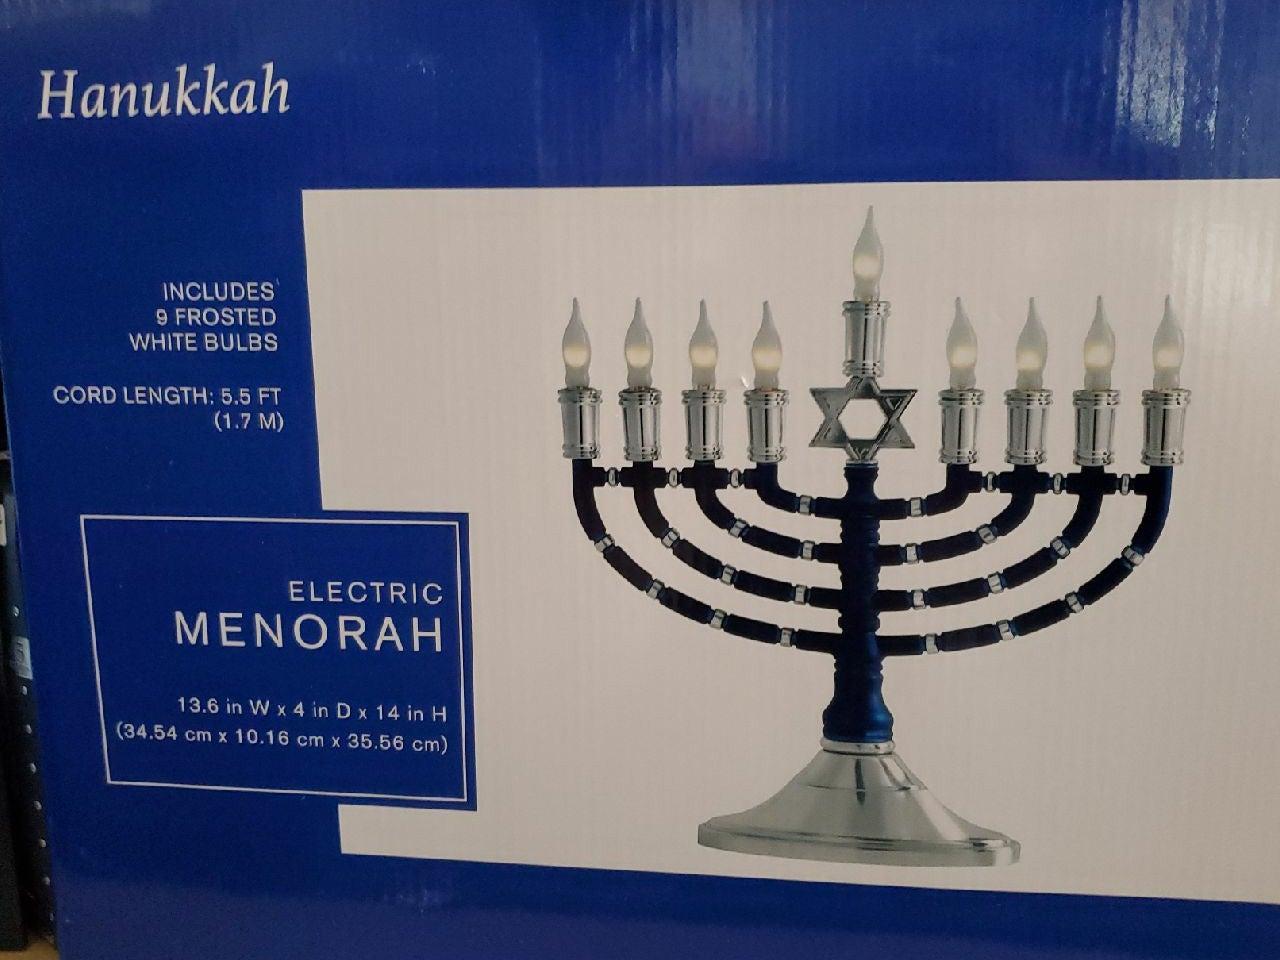 Electric menorah